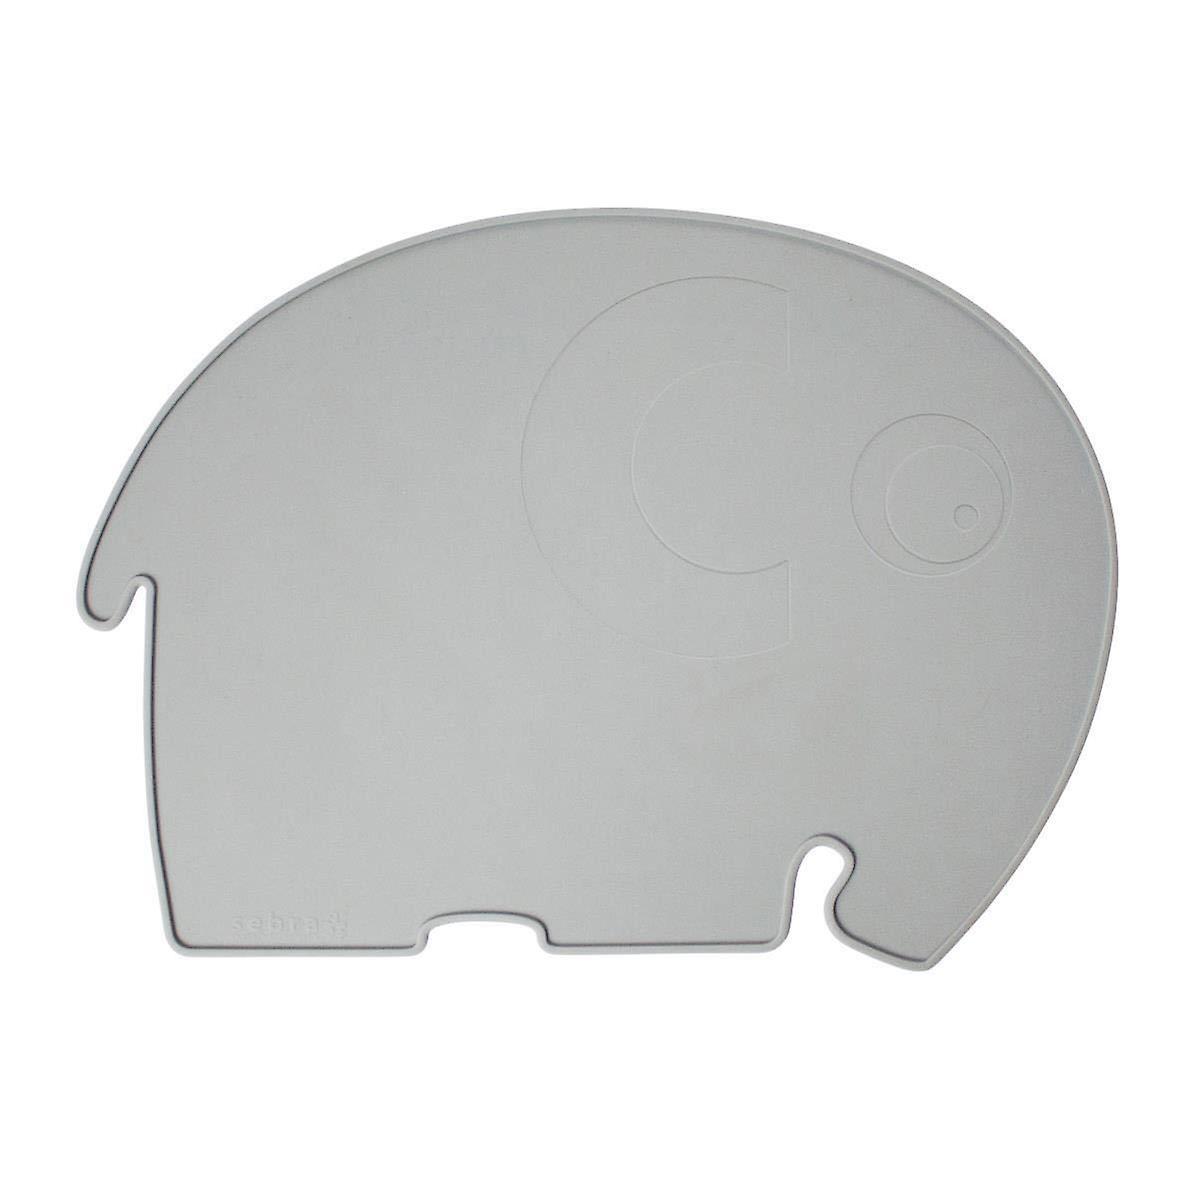 Sebra - silicone placemat - fanto the elephant - elephant grey